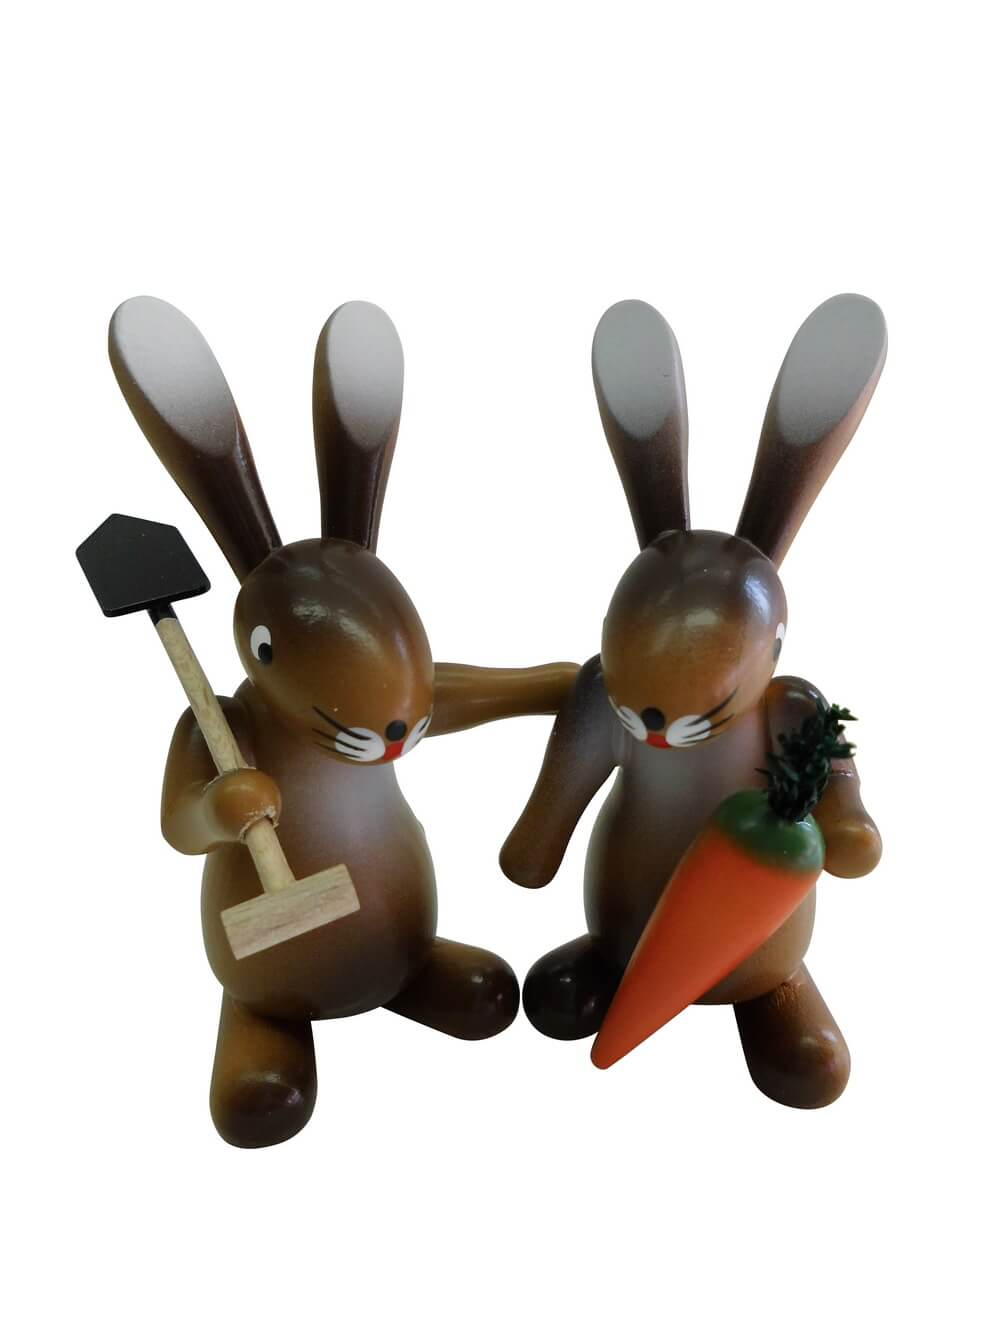 Osterhasenpaar Hasenfreunde, hochwertig handbemalt, 7 cm, Nestler-Seiffen.com OHG Seiffen/ Erzgebirge